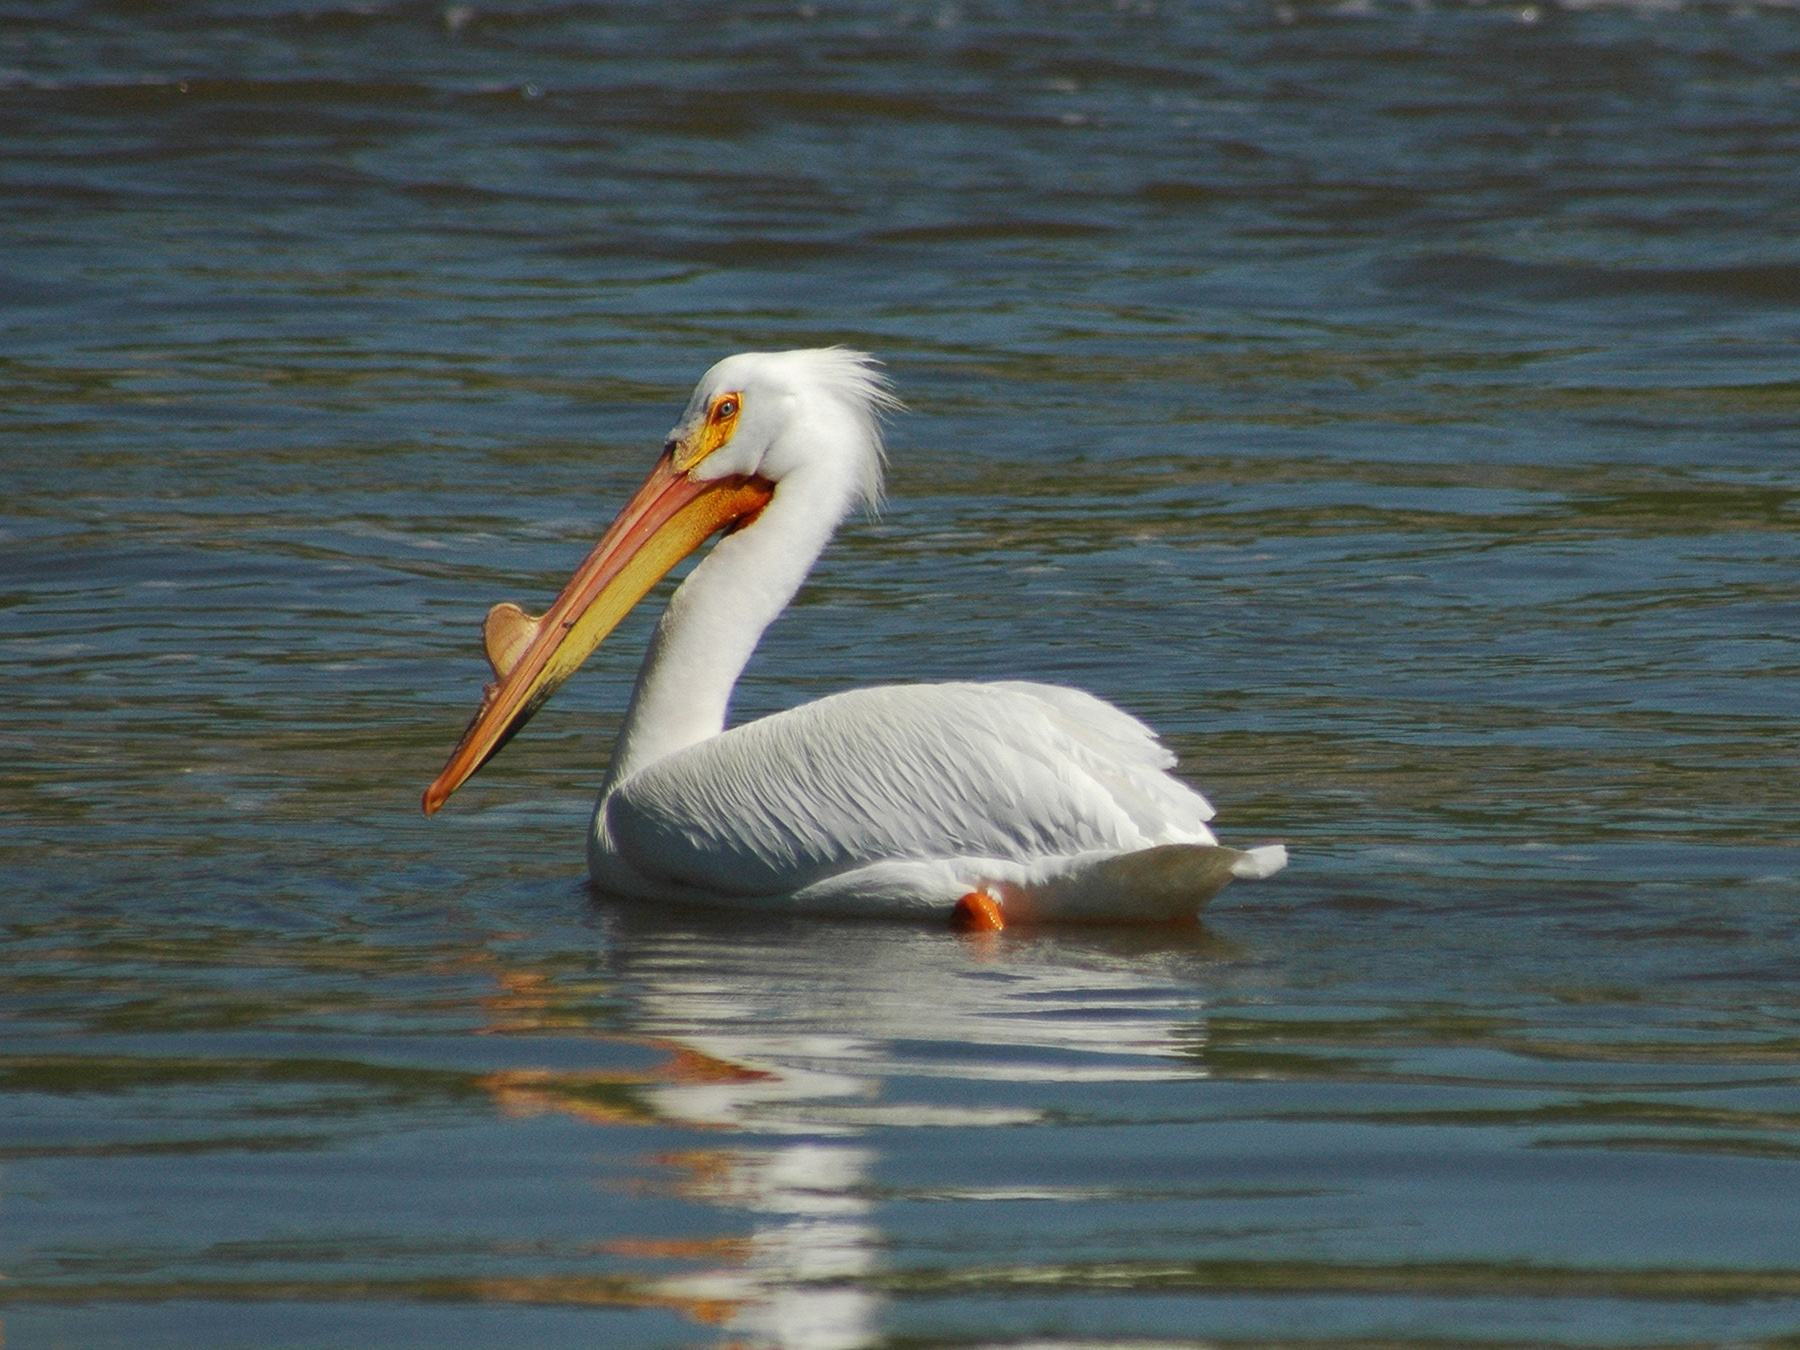 White Pelican the Gulf of Mexico. Credit U.S. Dept of Interior